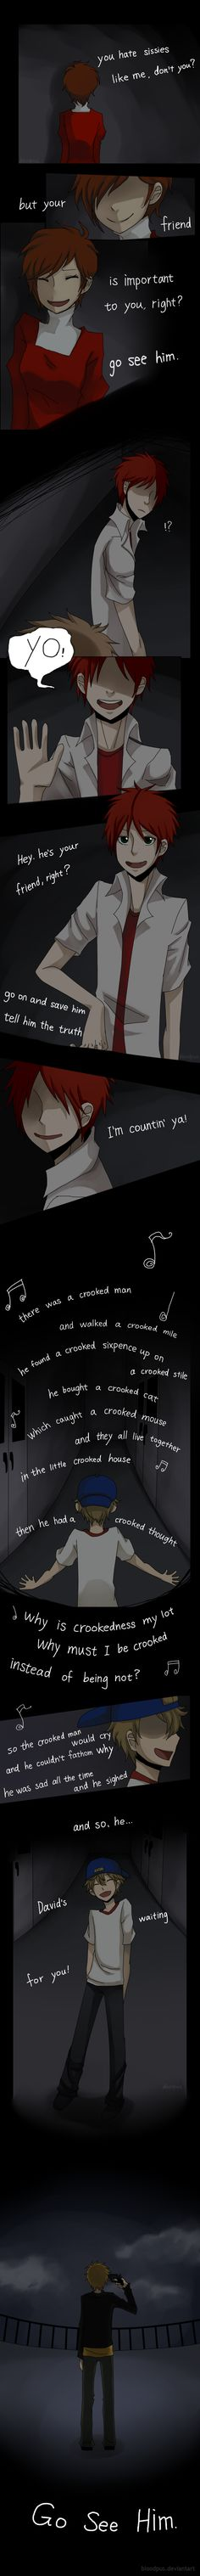 The crooked man by Bloodpus.deviantart.com on @DeviantArt